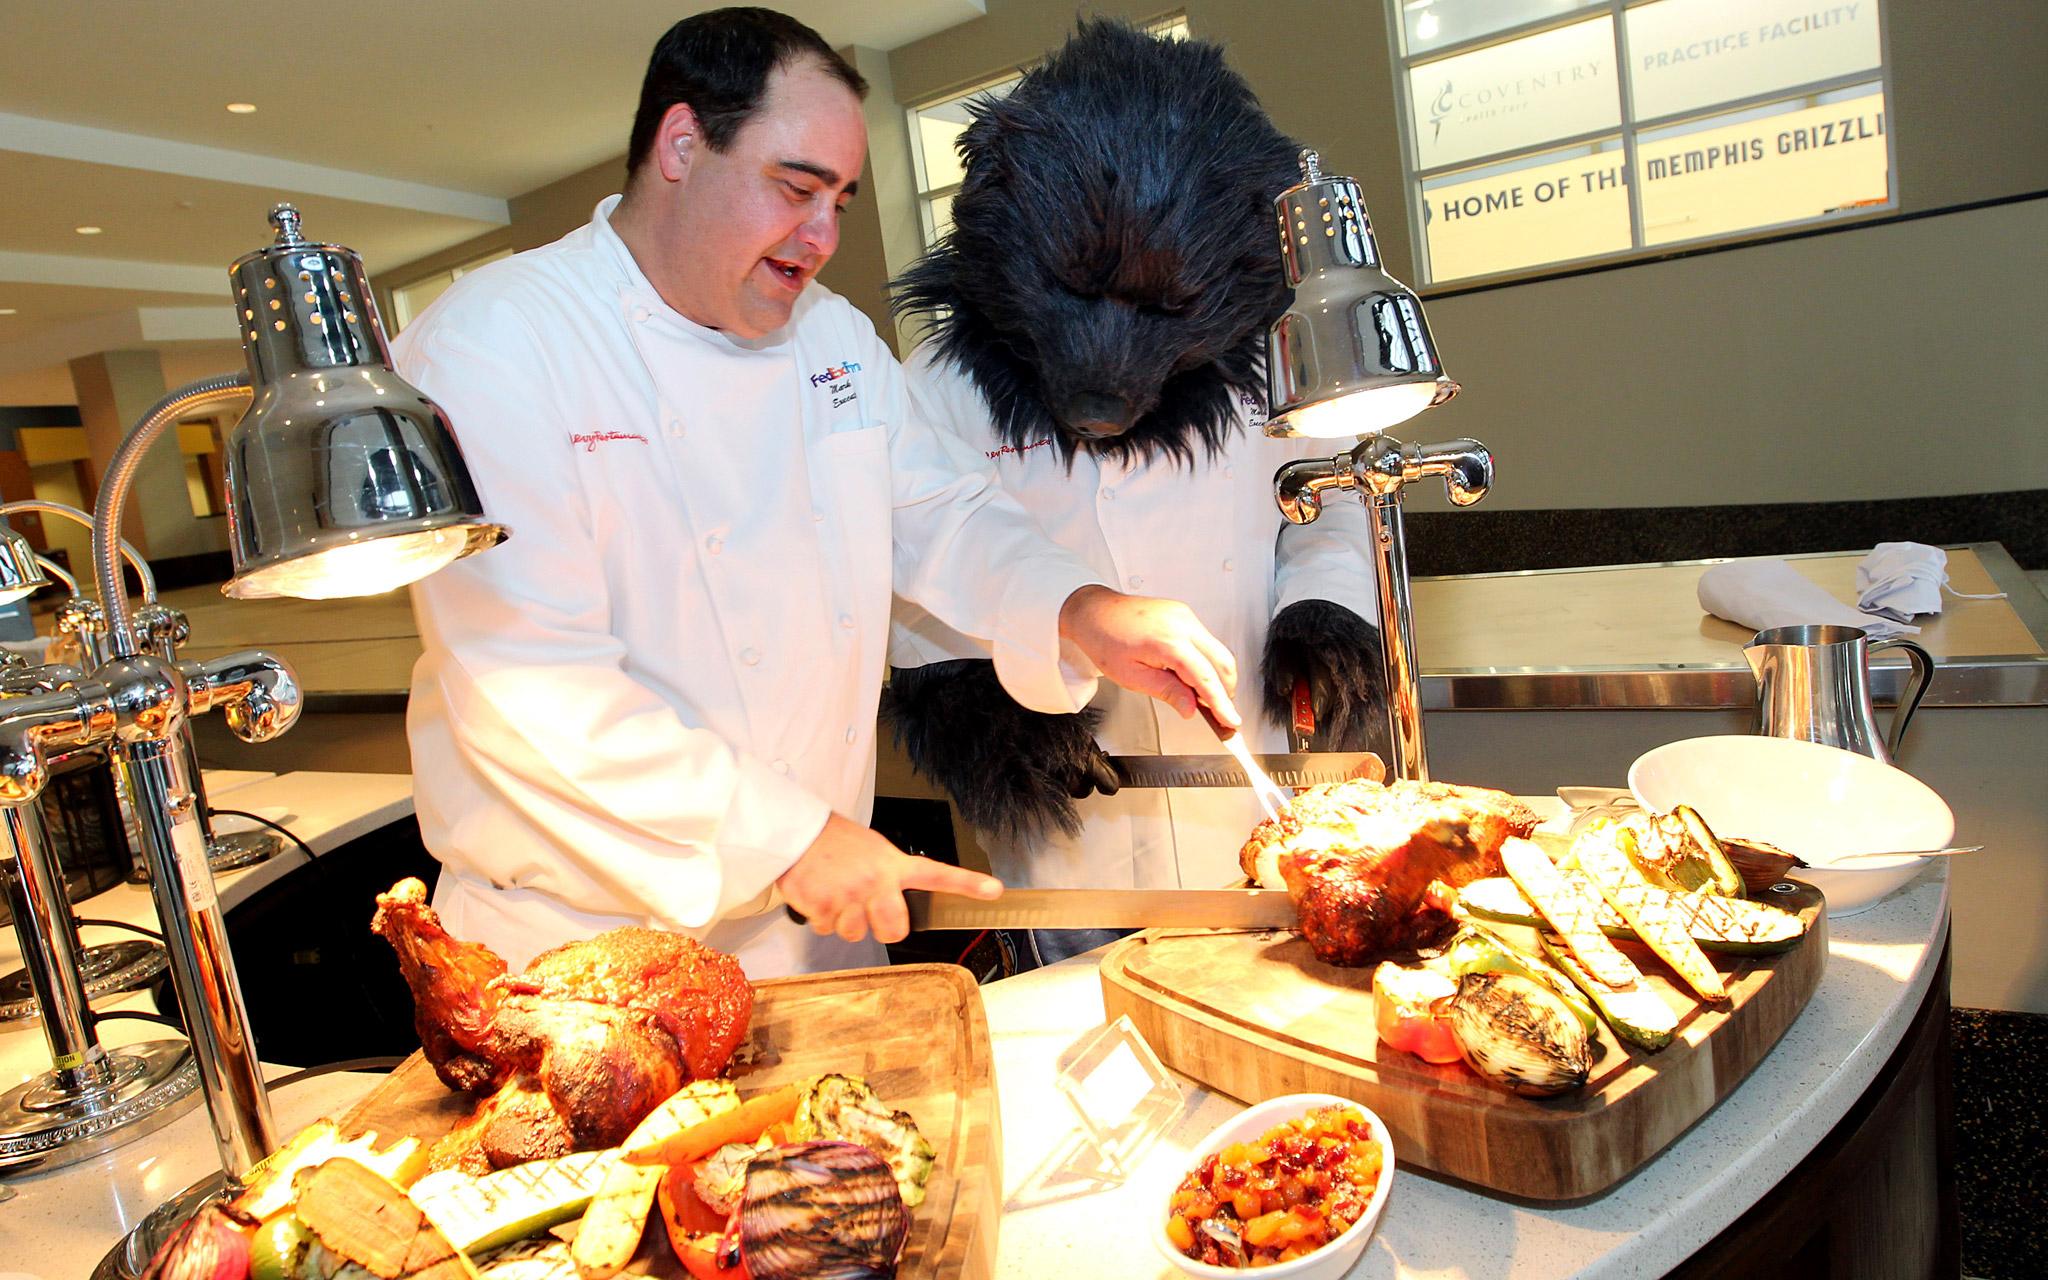 Chef Grizz